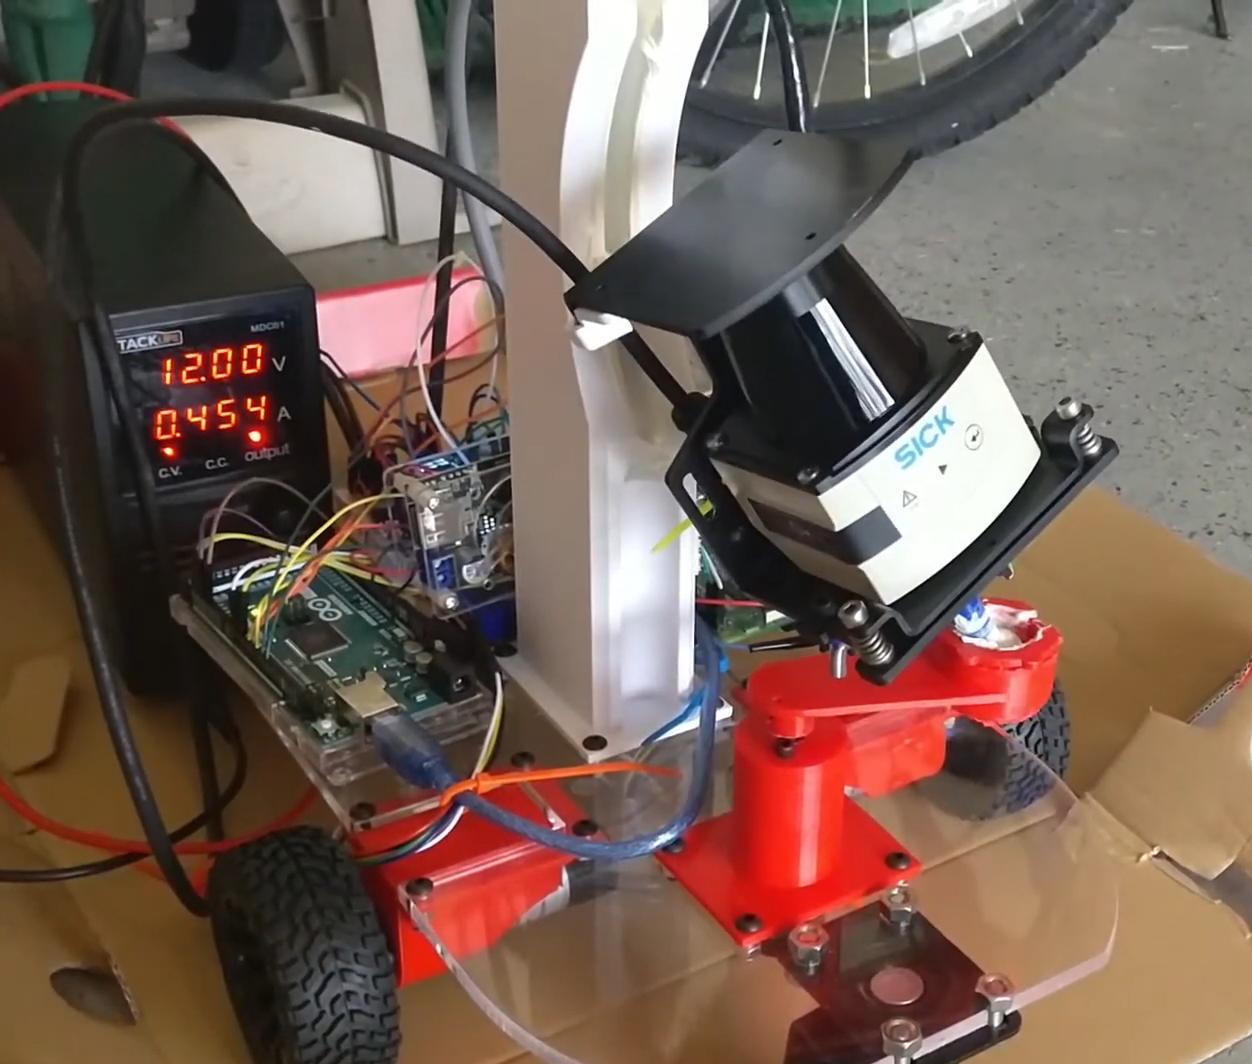 2d lidar sensors, TiM$10K Challenge Contributors Revolutionize Dangerous Profession with LiDAR Technology